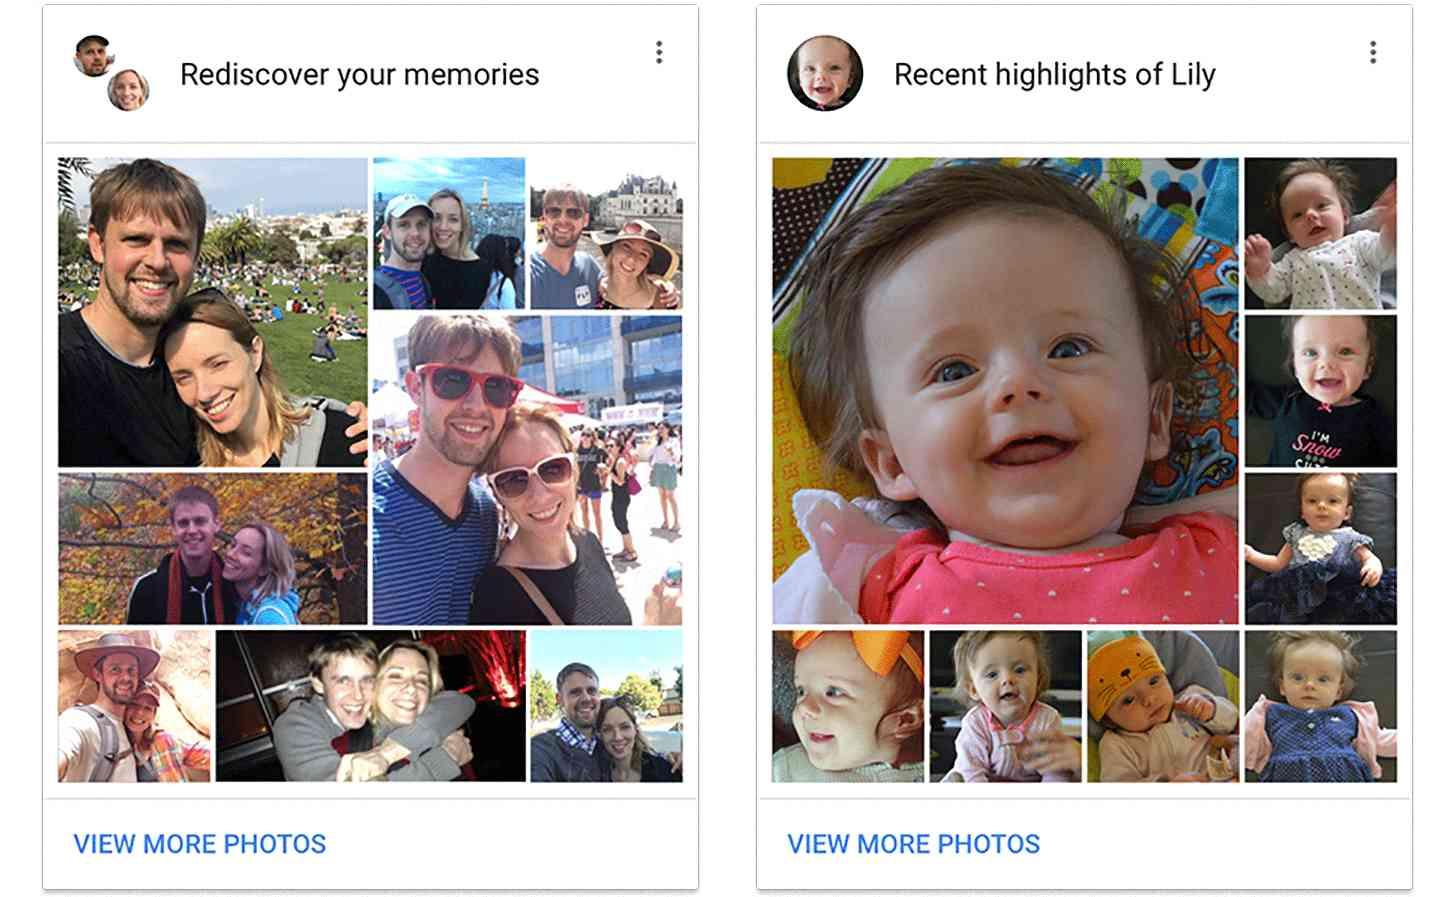 Google Photos Highlights